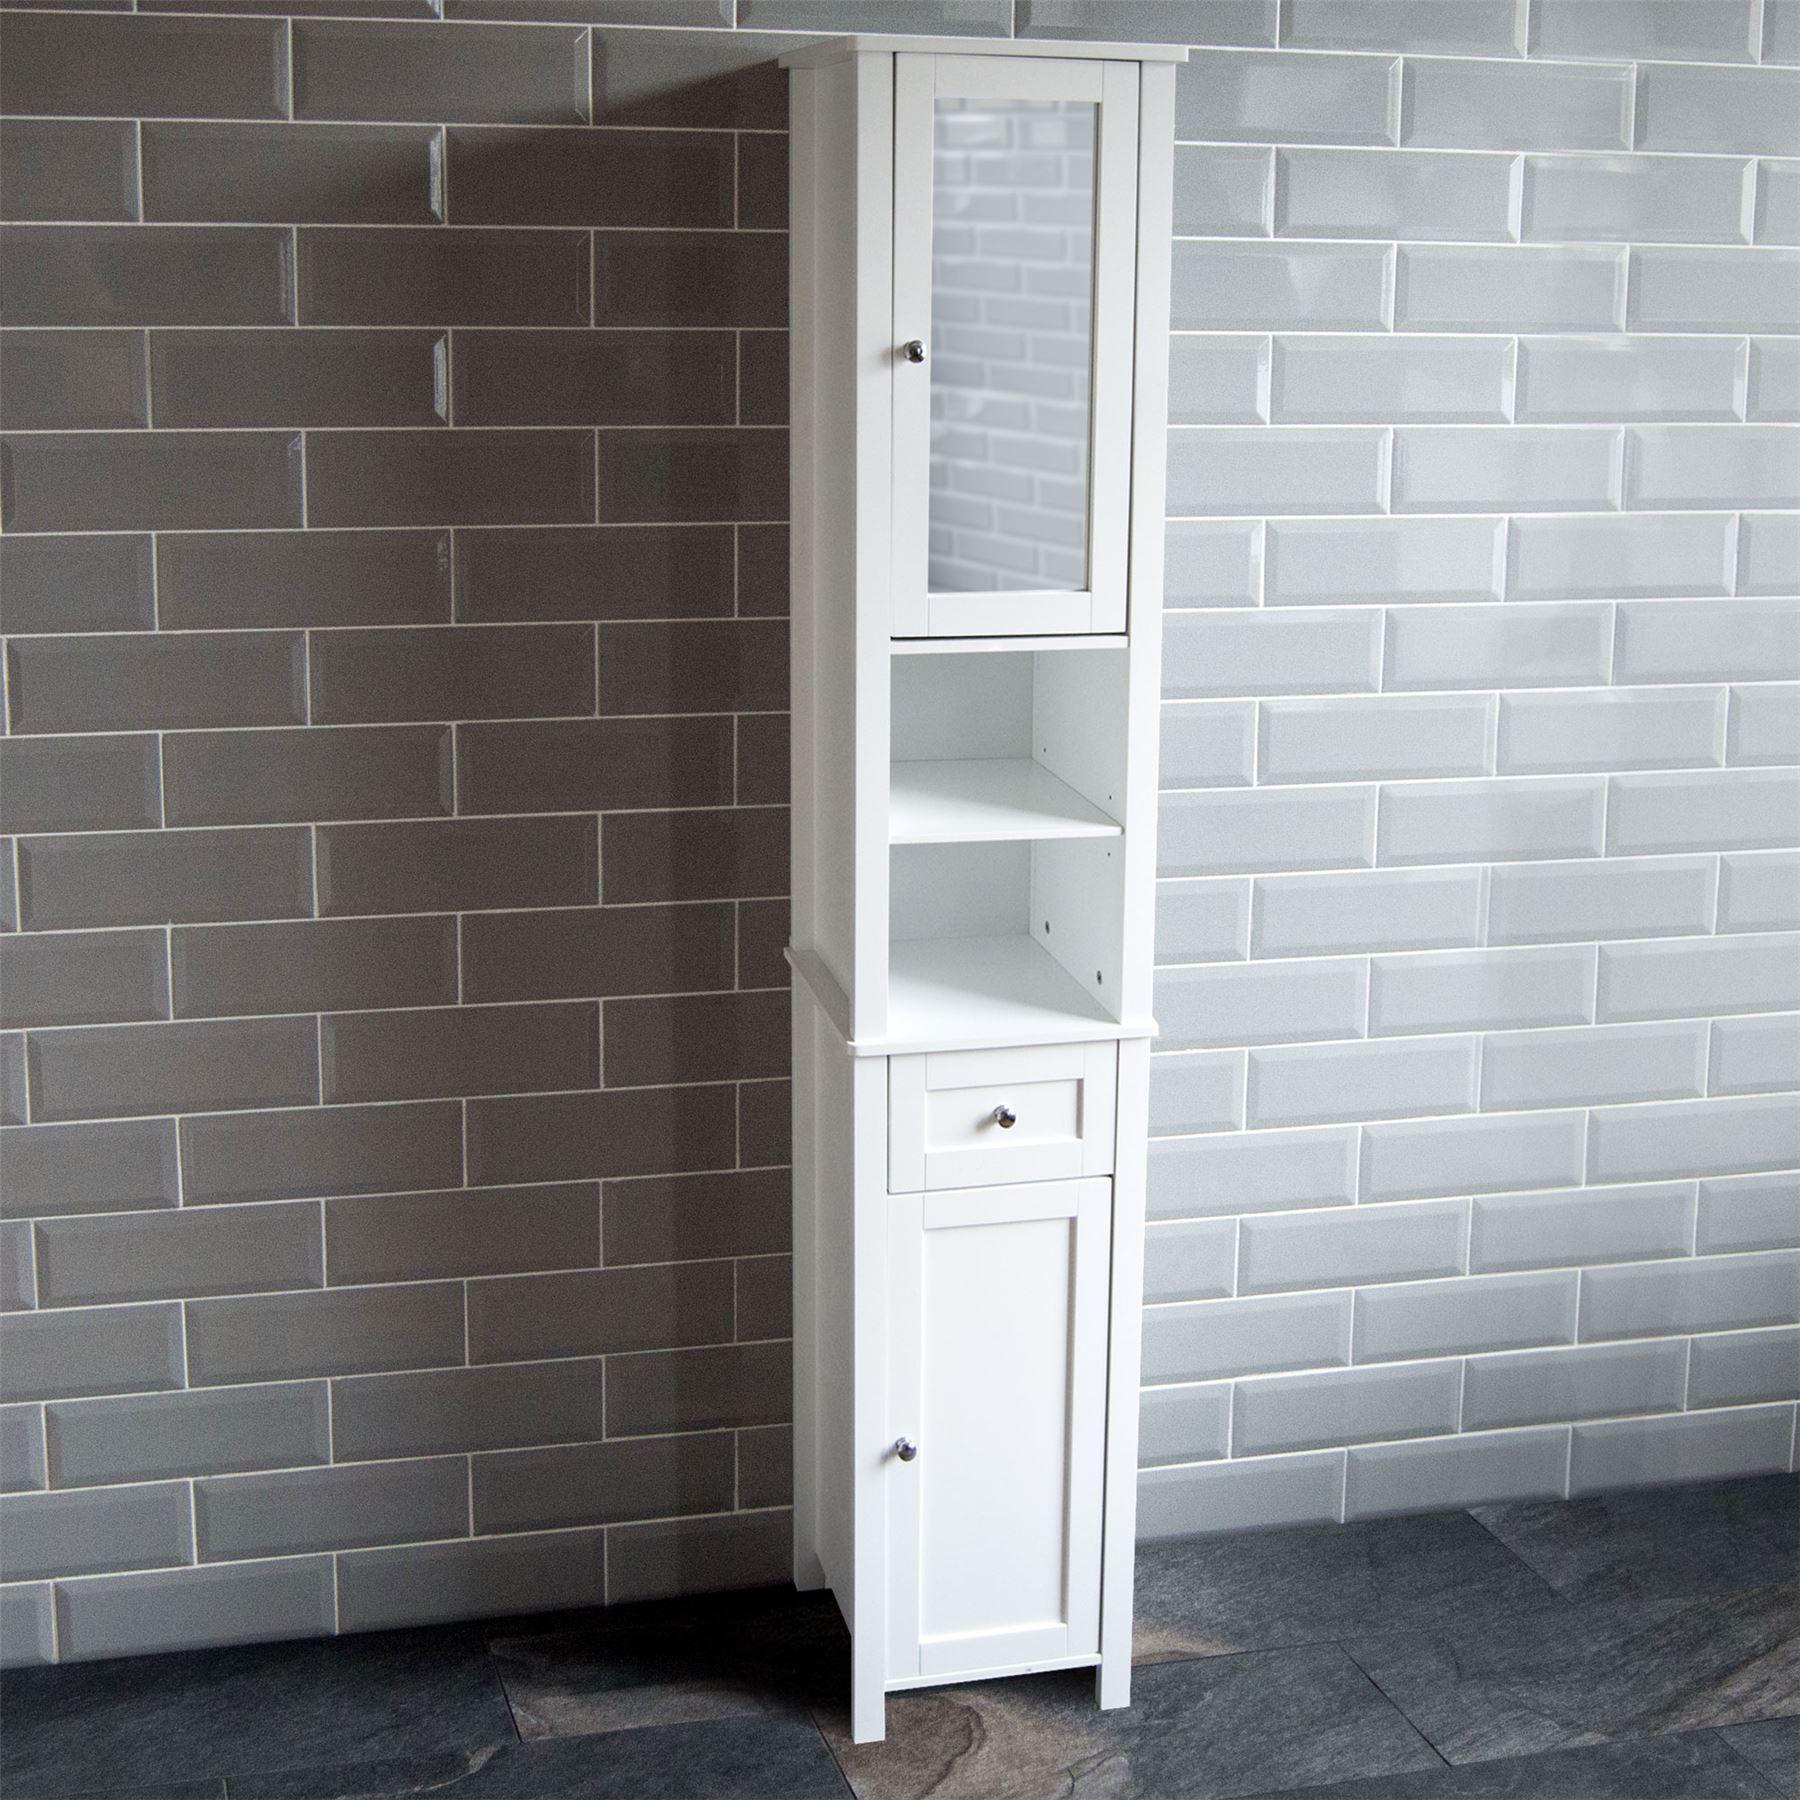 Milano Tall Bathroom Cabinet Mirrored Door Cupboard Storage Shelf Shelving Unit